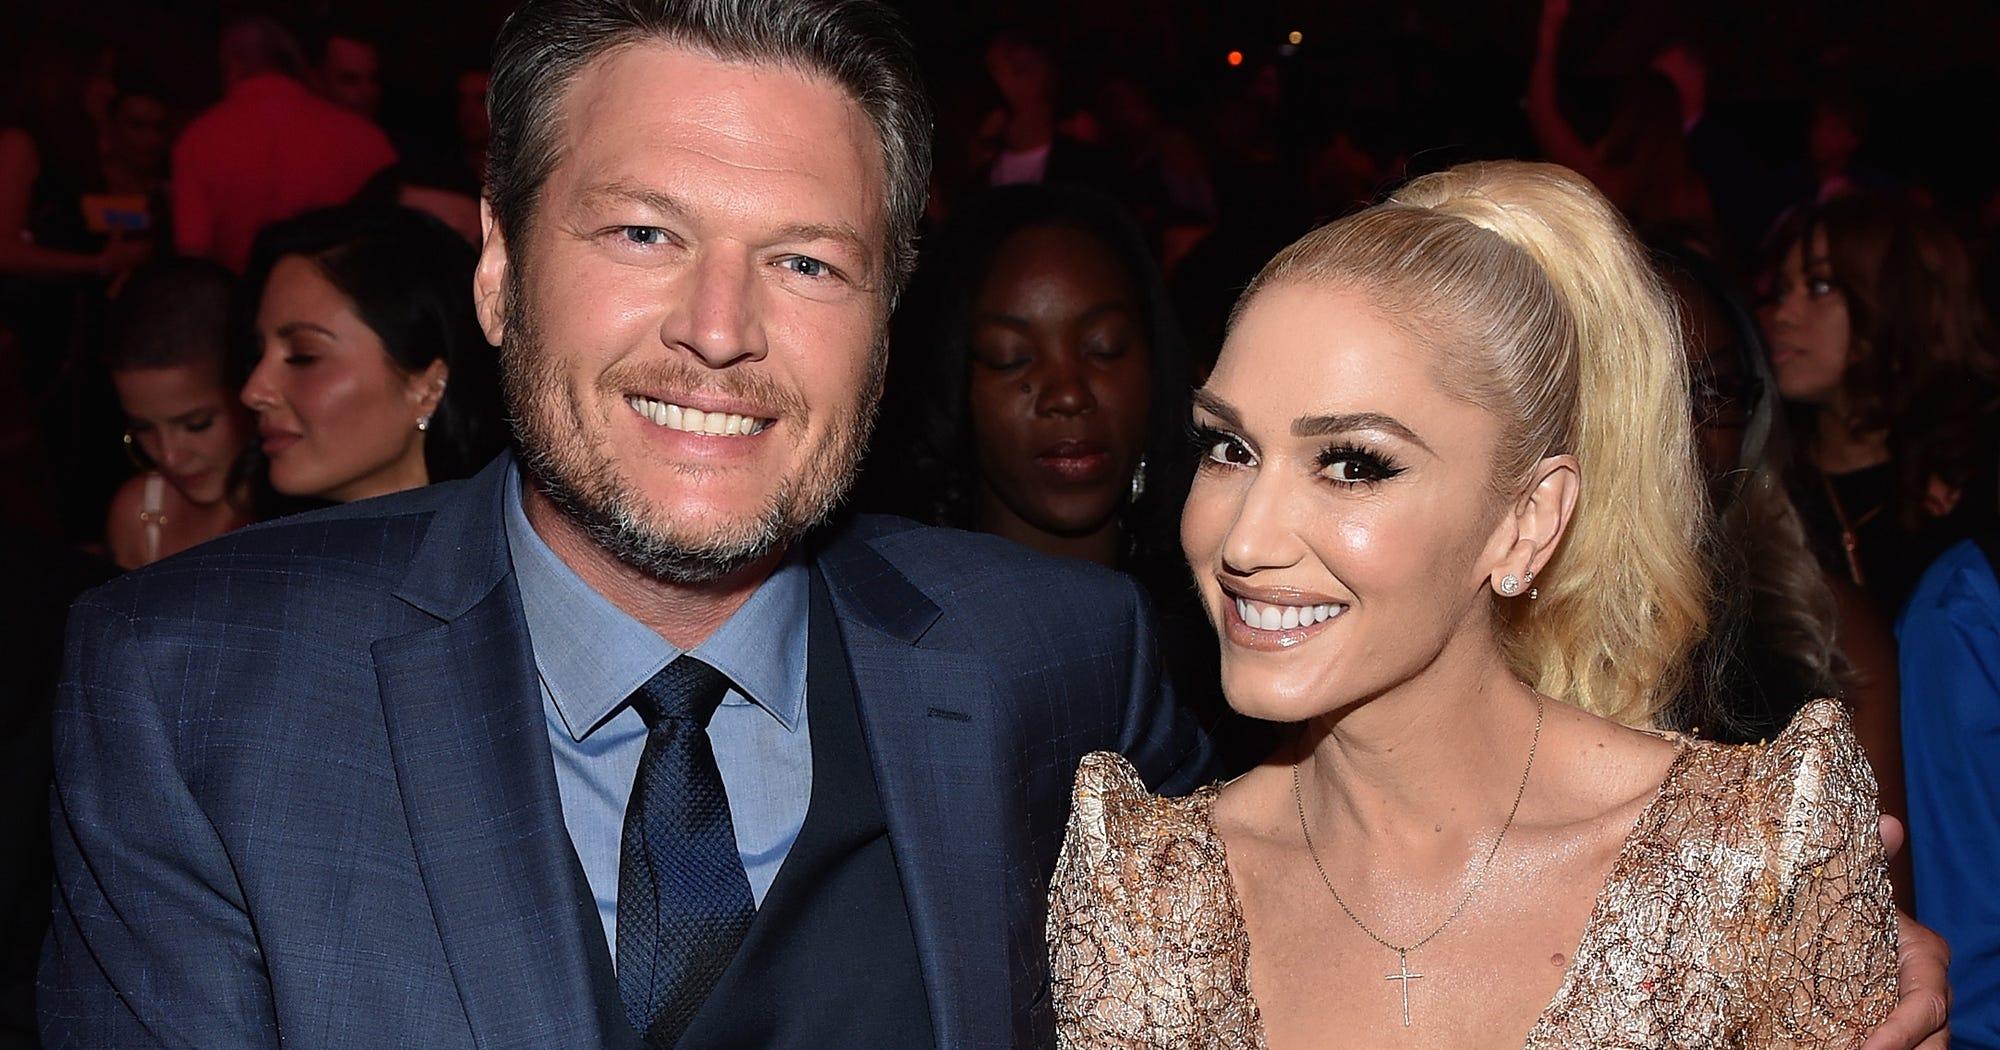 Blake Shelton Revealed the Real Reason Why He Wont Marry Gwen Stefani